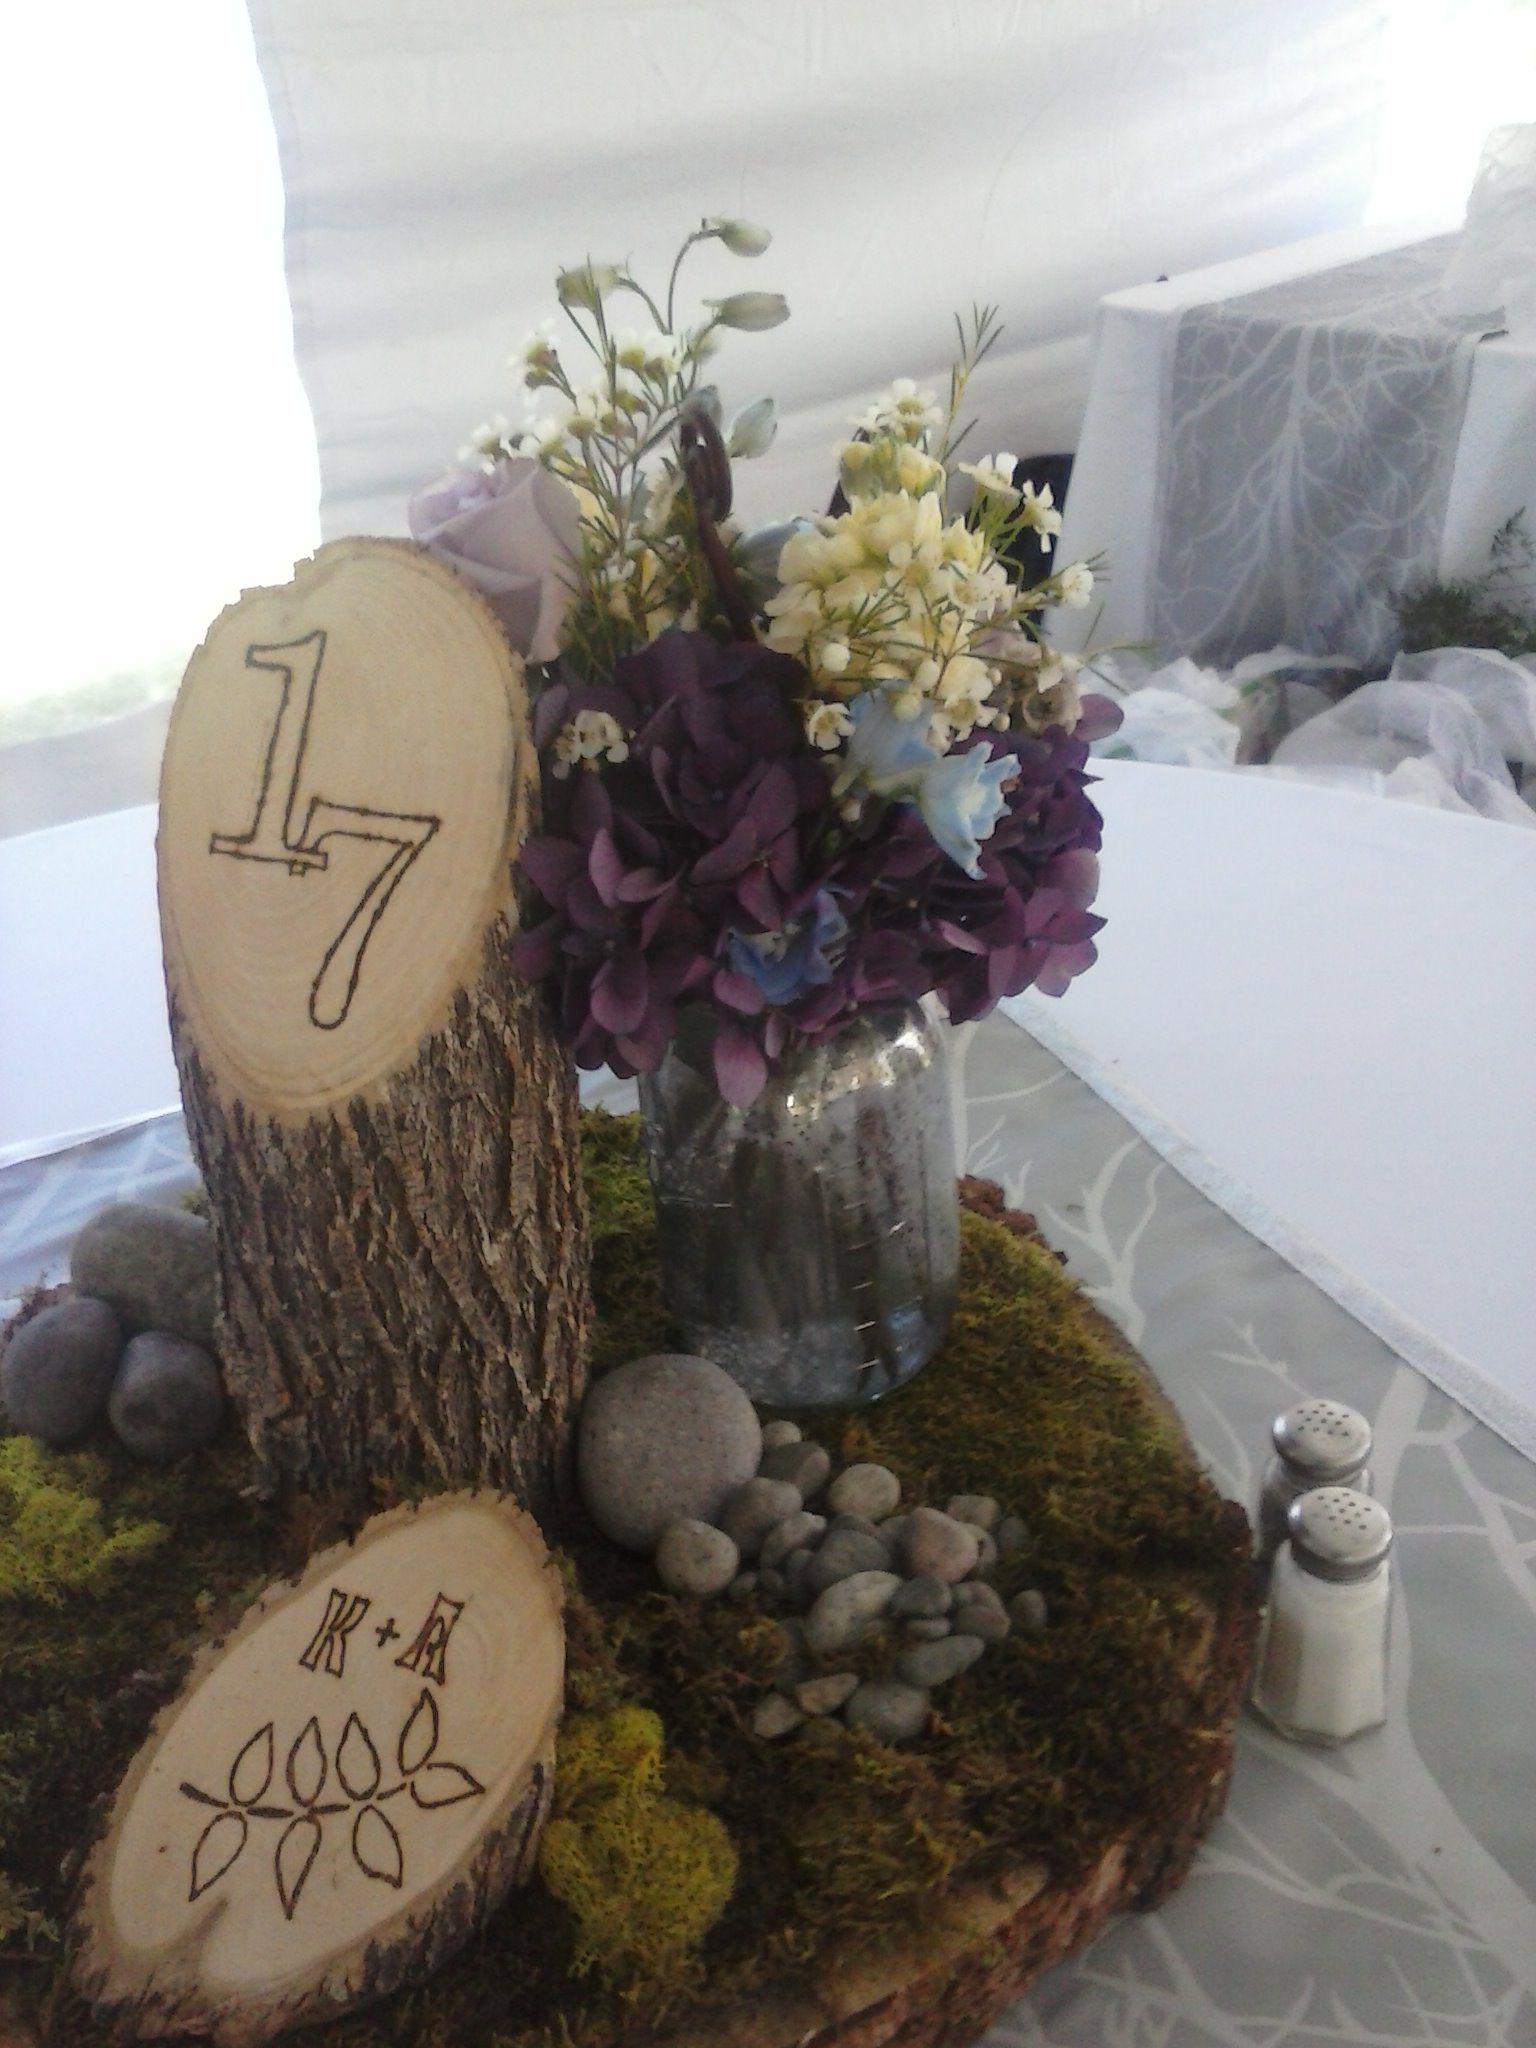 Bon Designed By The Country Florist: Fairy Garden Centerpiece. Wood Stump,  Mason Jar, Moss, Pebbles, Stock, Hydrangea, Wax Flower, And Delphinium.